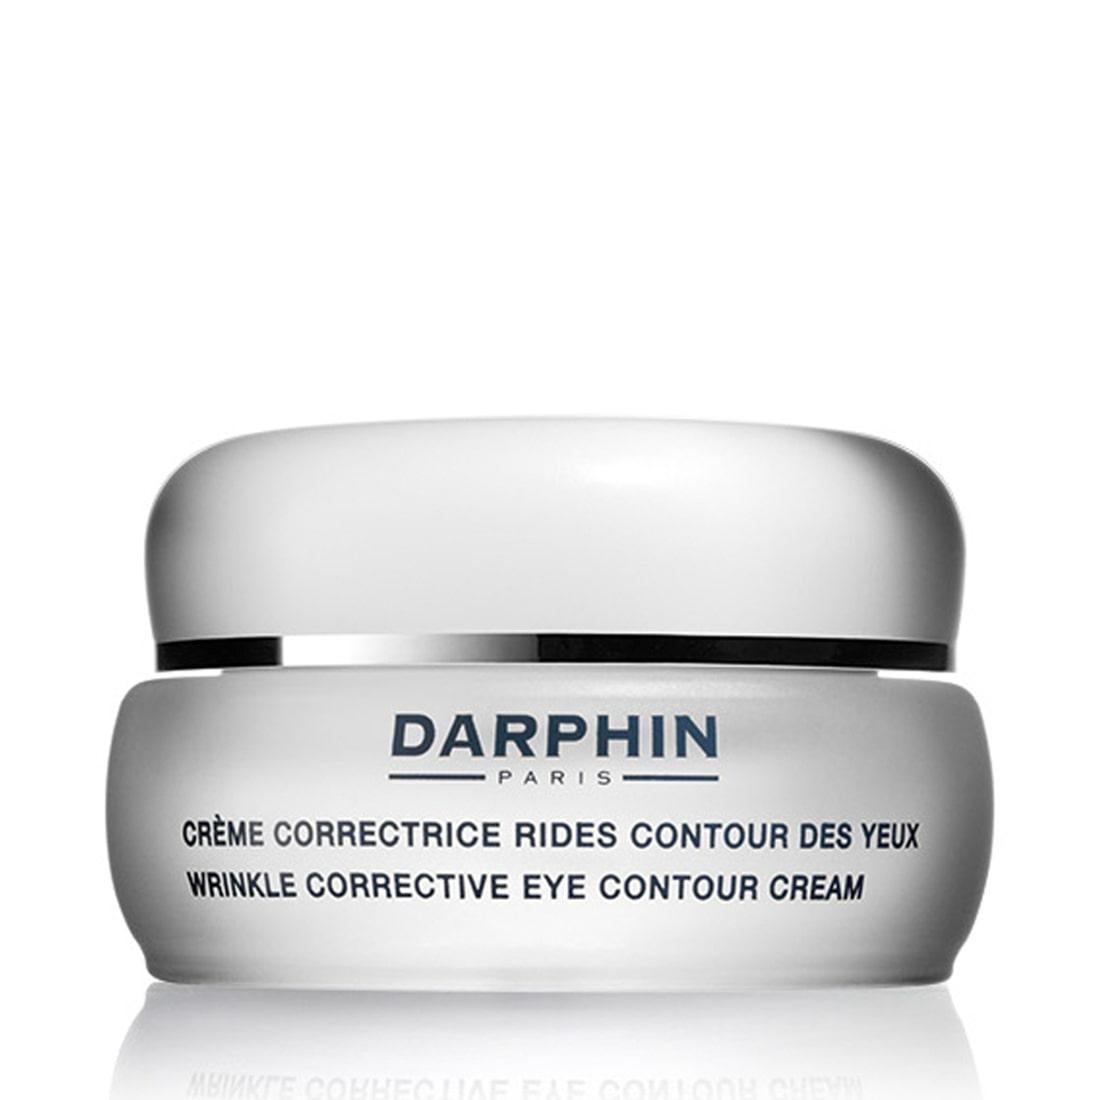 Wrinkle corrective eye contour cream 15 ml